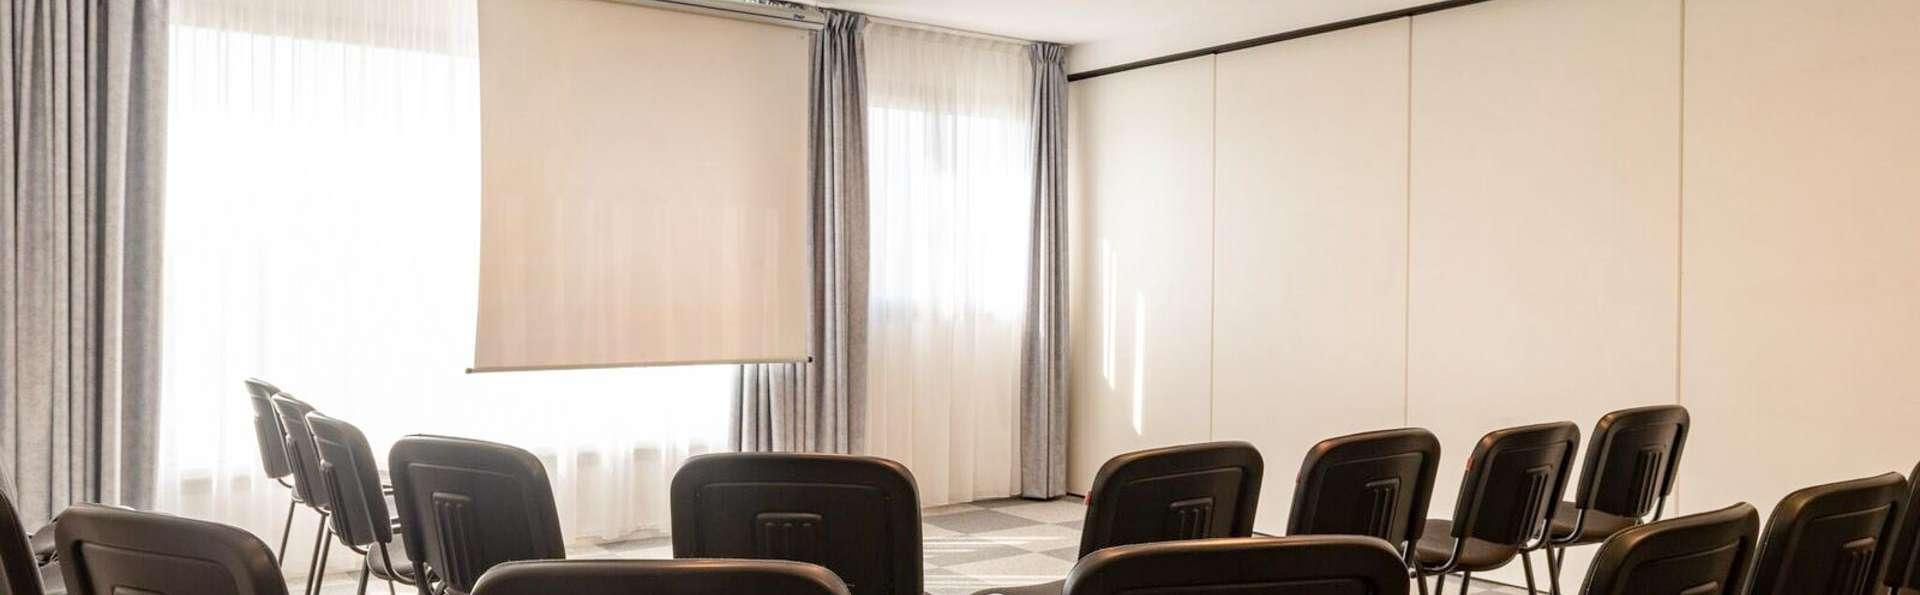 Hotel The Originals Bernay Acropole - EDIT_NEW_MEETING_01.jpg